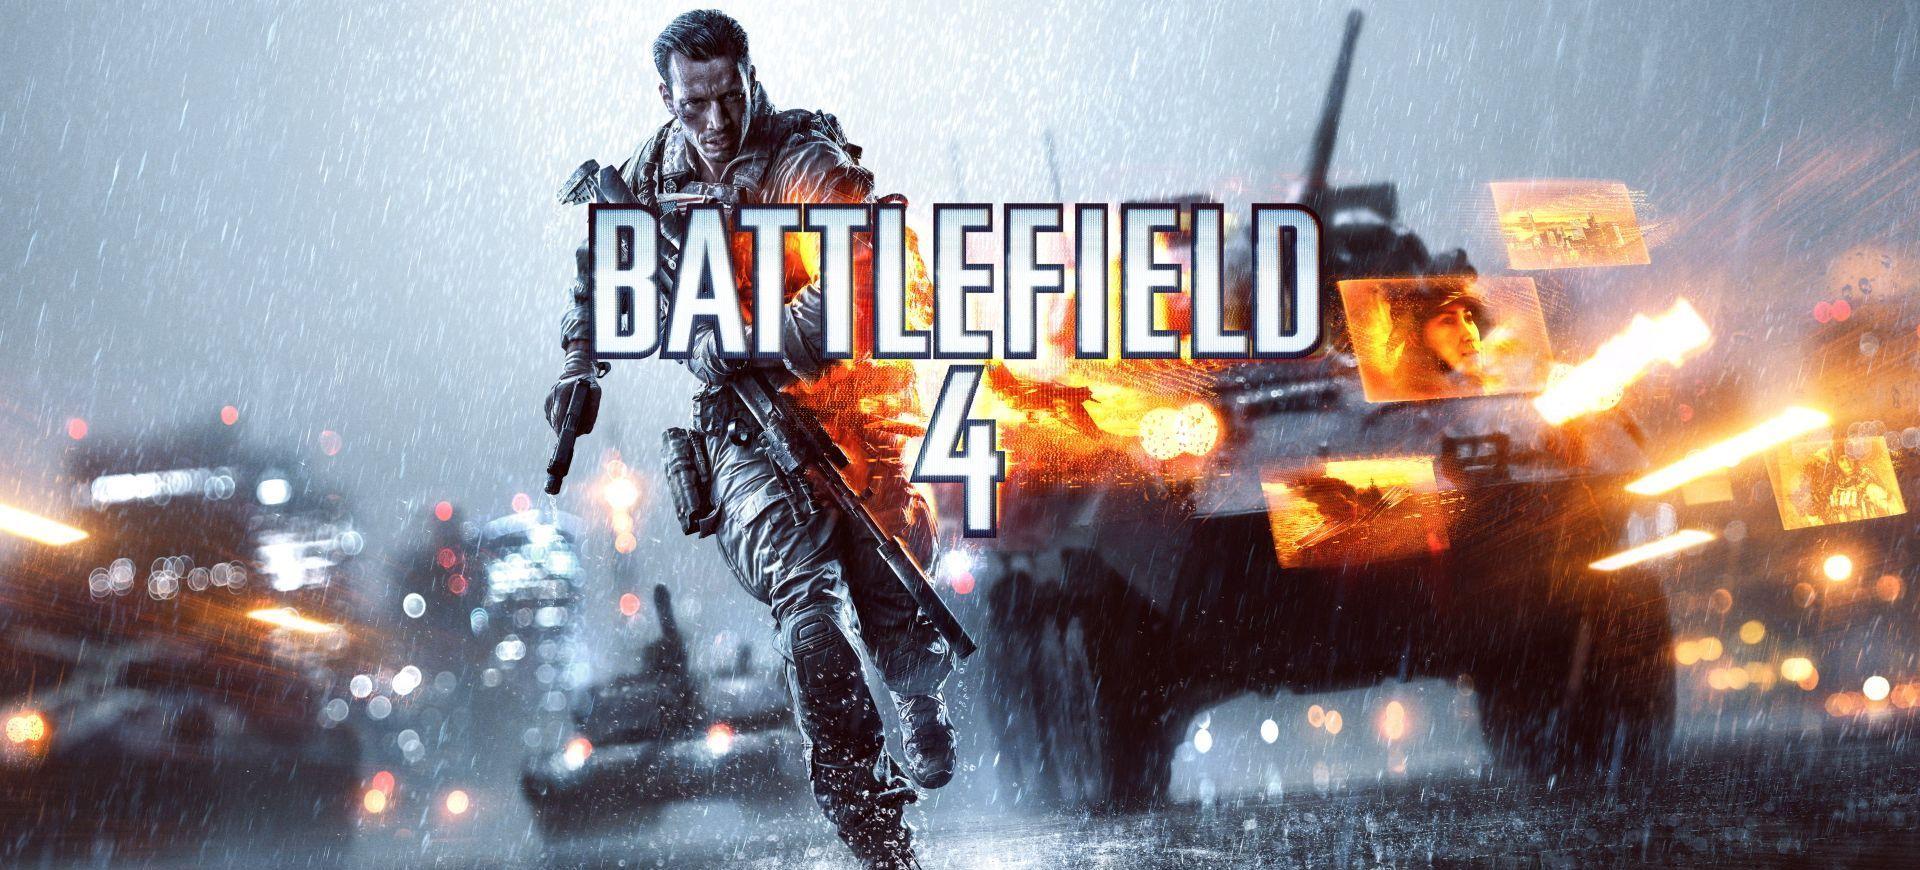 Battlefield 4 - Đánh Giá Game